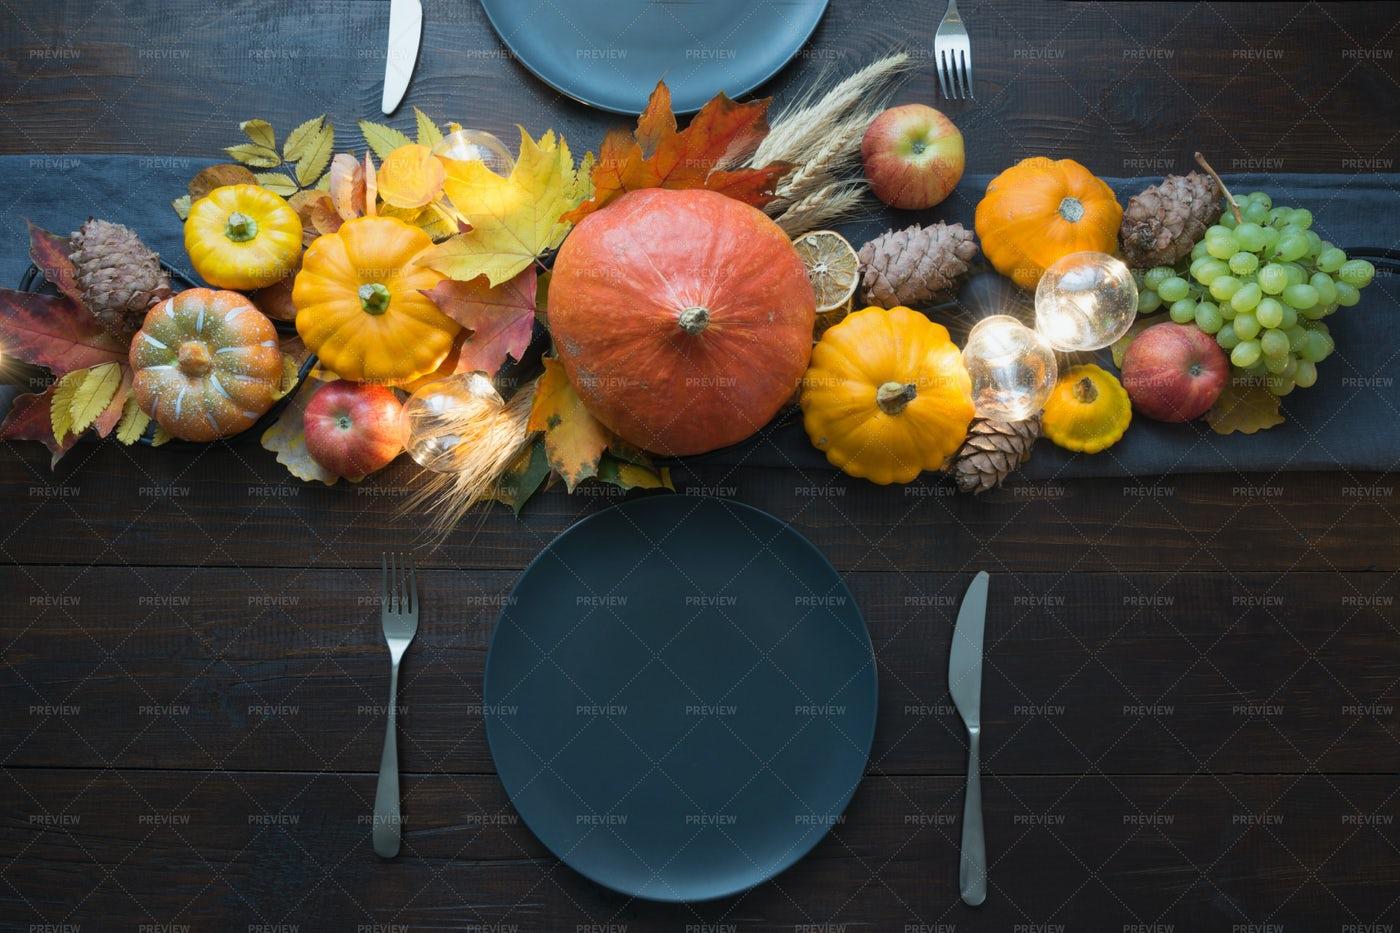 Table Set Up During Autumn: Stock Photos